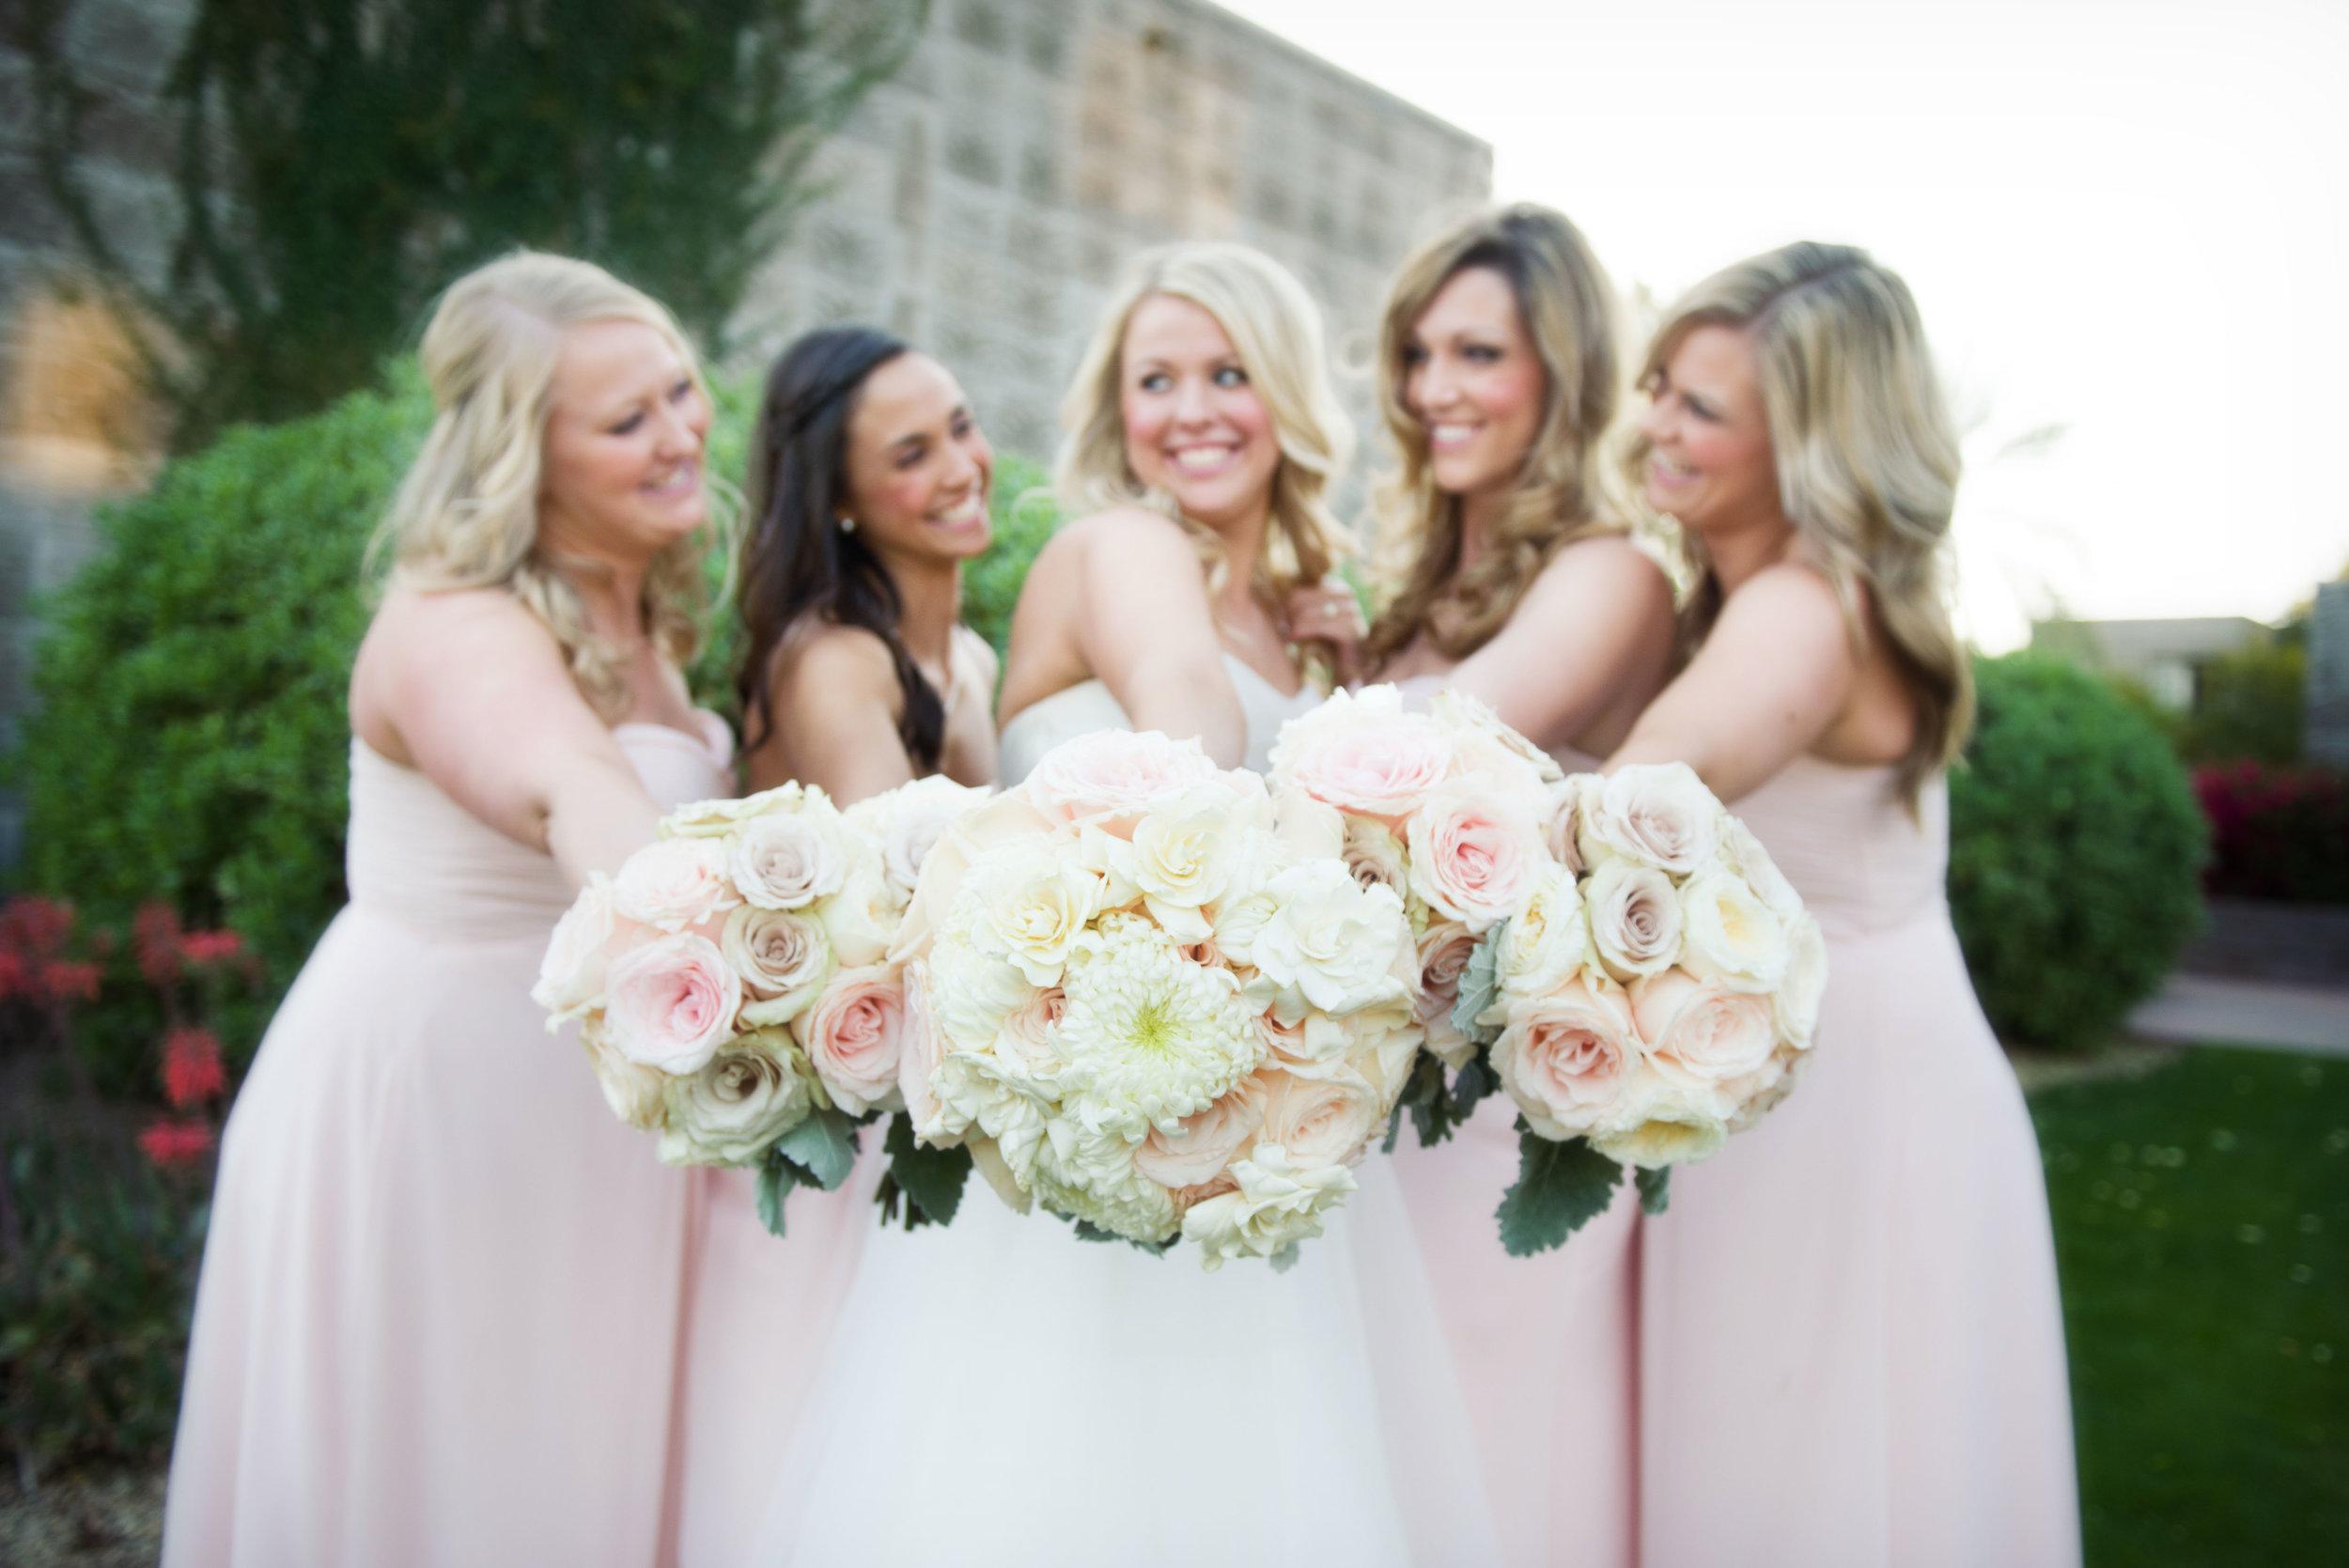 weddingwebsitesmallerpics-62.jpg